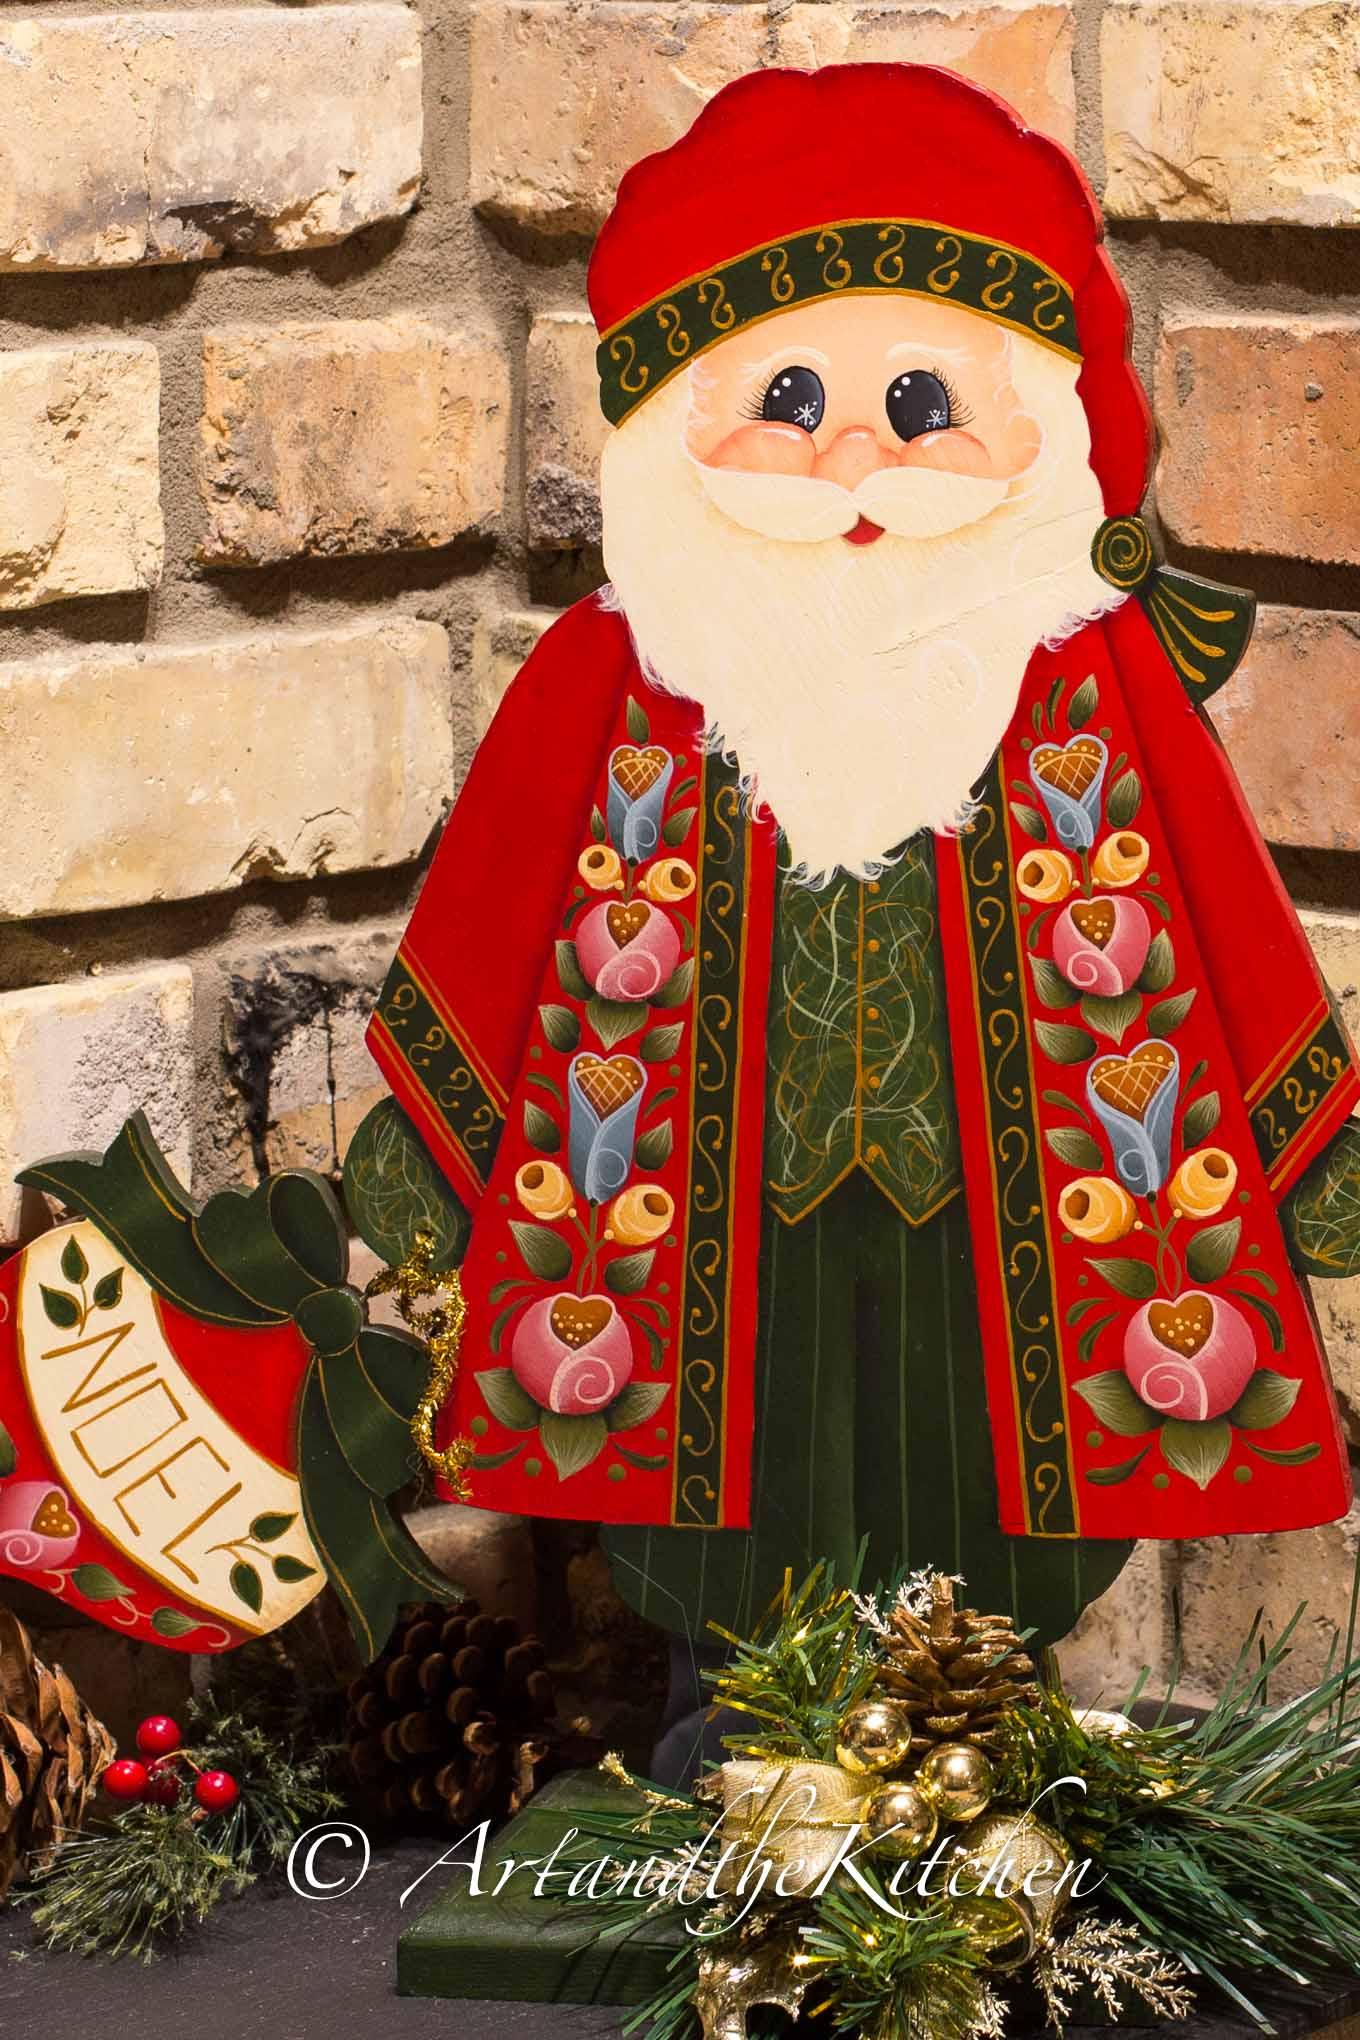 Decorative hand painted wood Santa